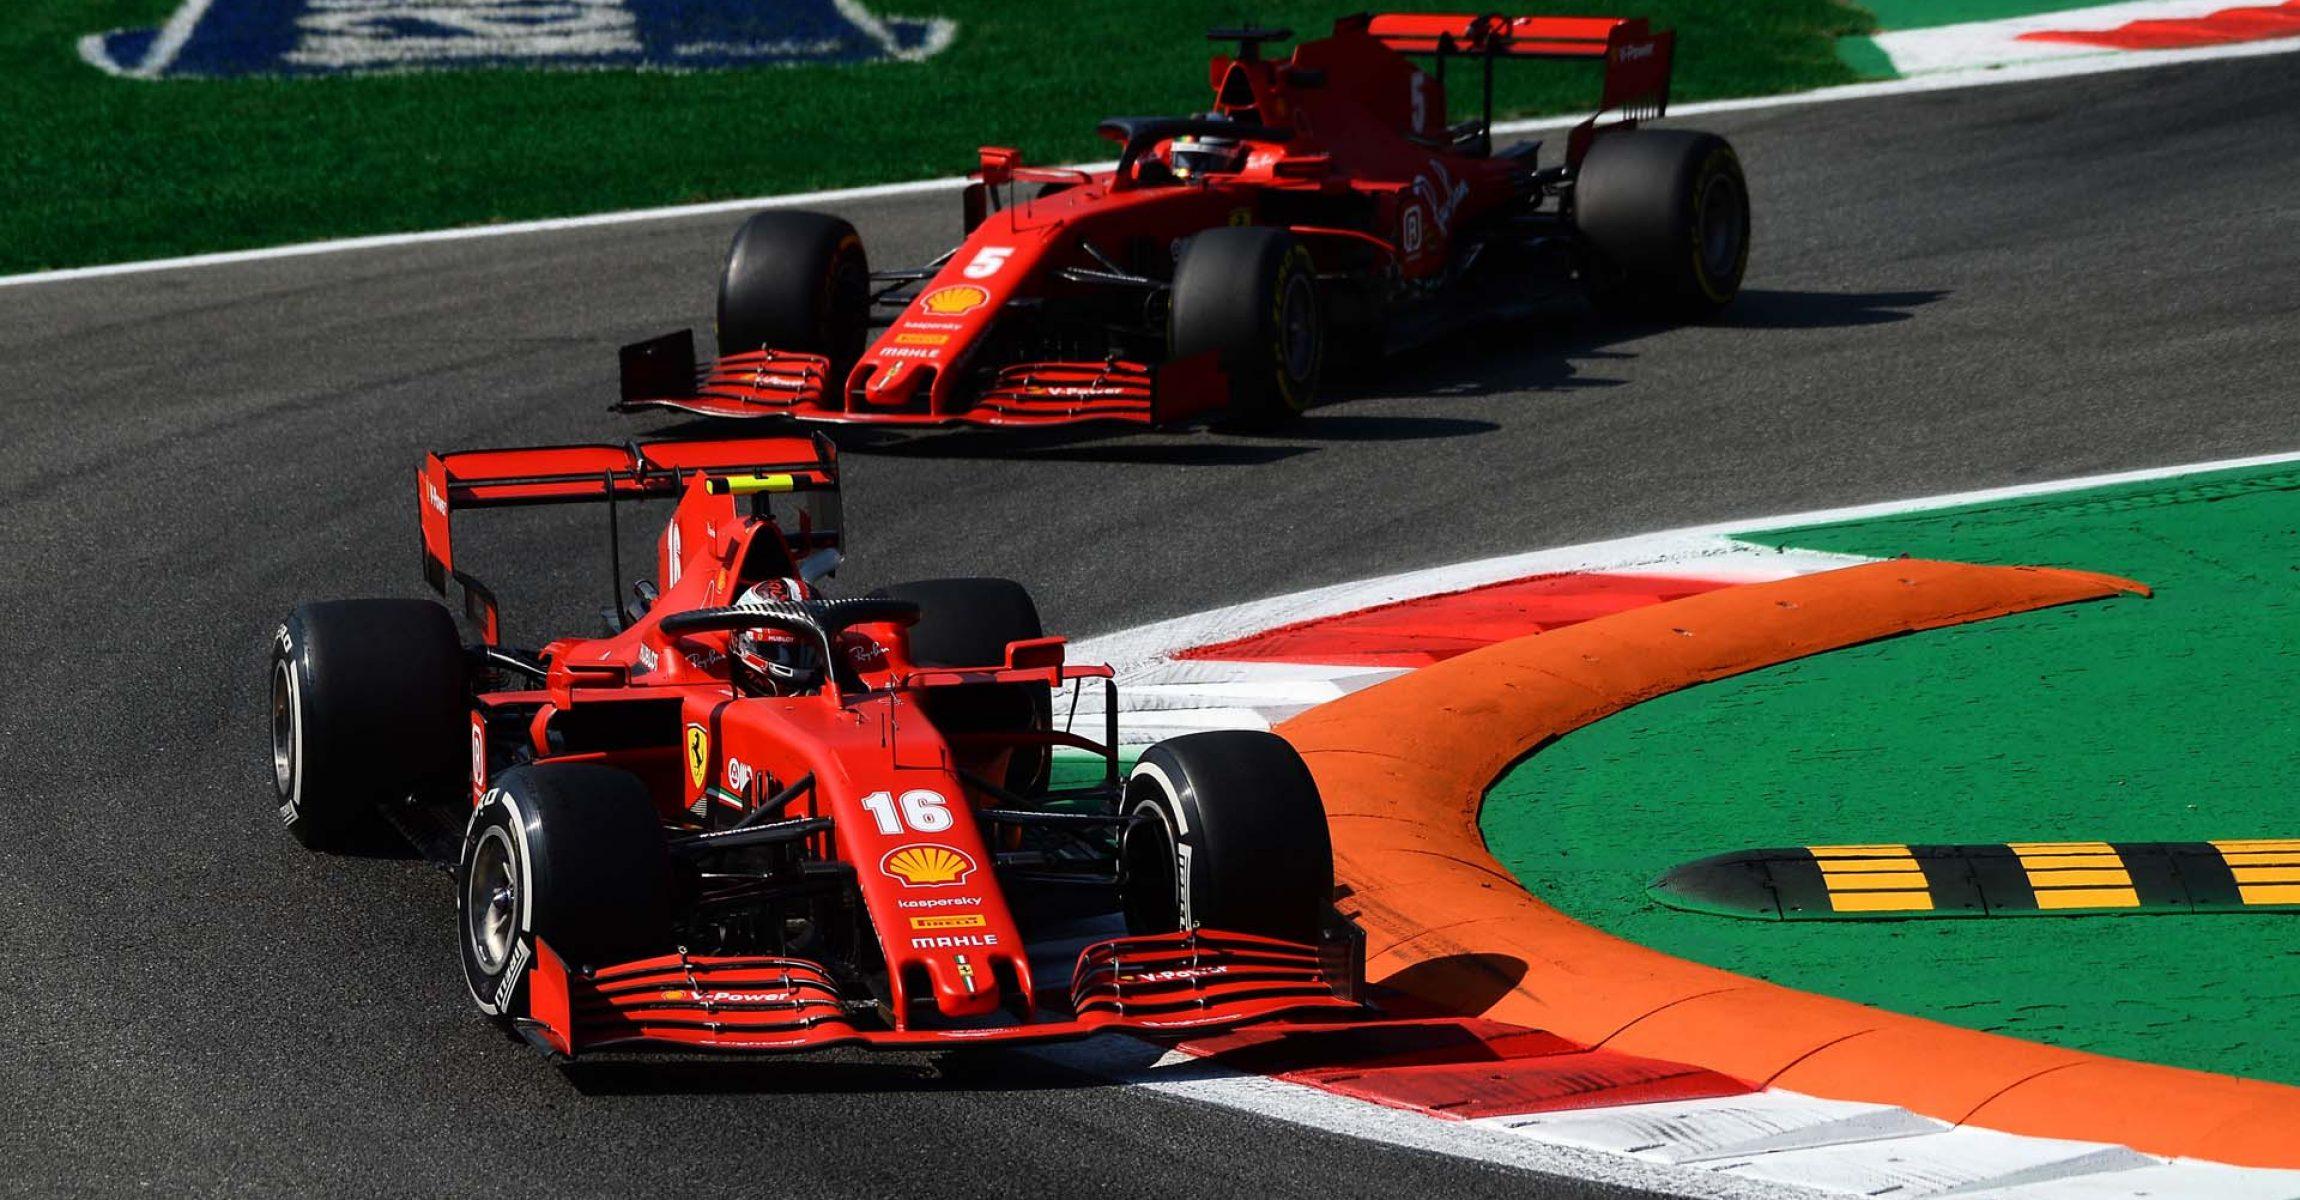 GP ITALIA F1/2020 -  VENERDÌ 04/09/2020       credit: @Scuderia Ferrari Press Office Charles Leclerc Sebastian Vettel